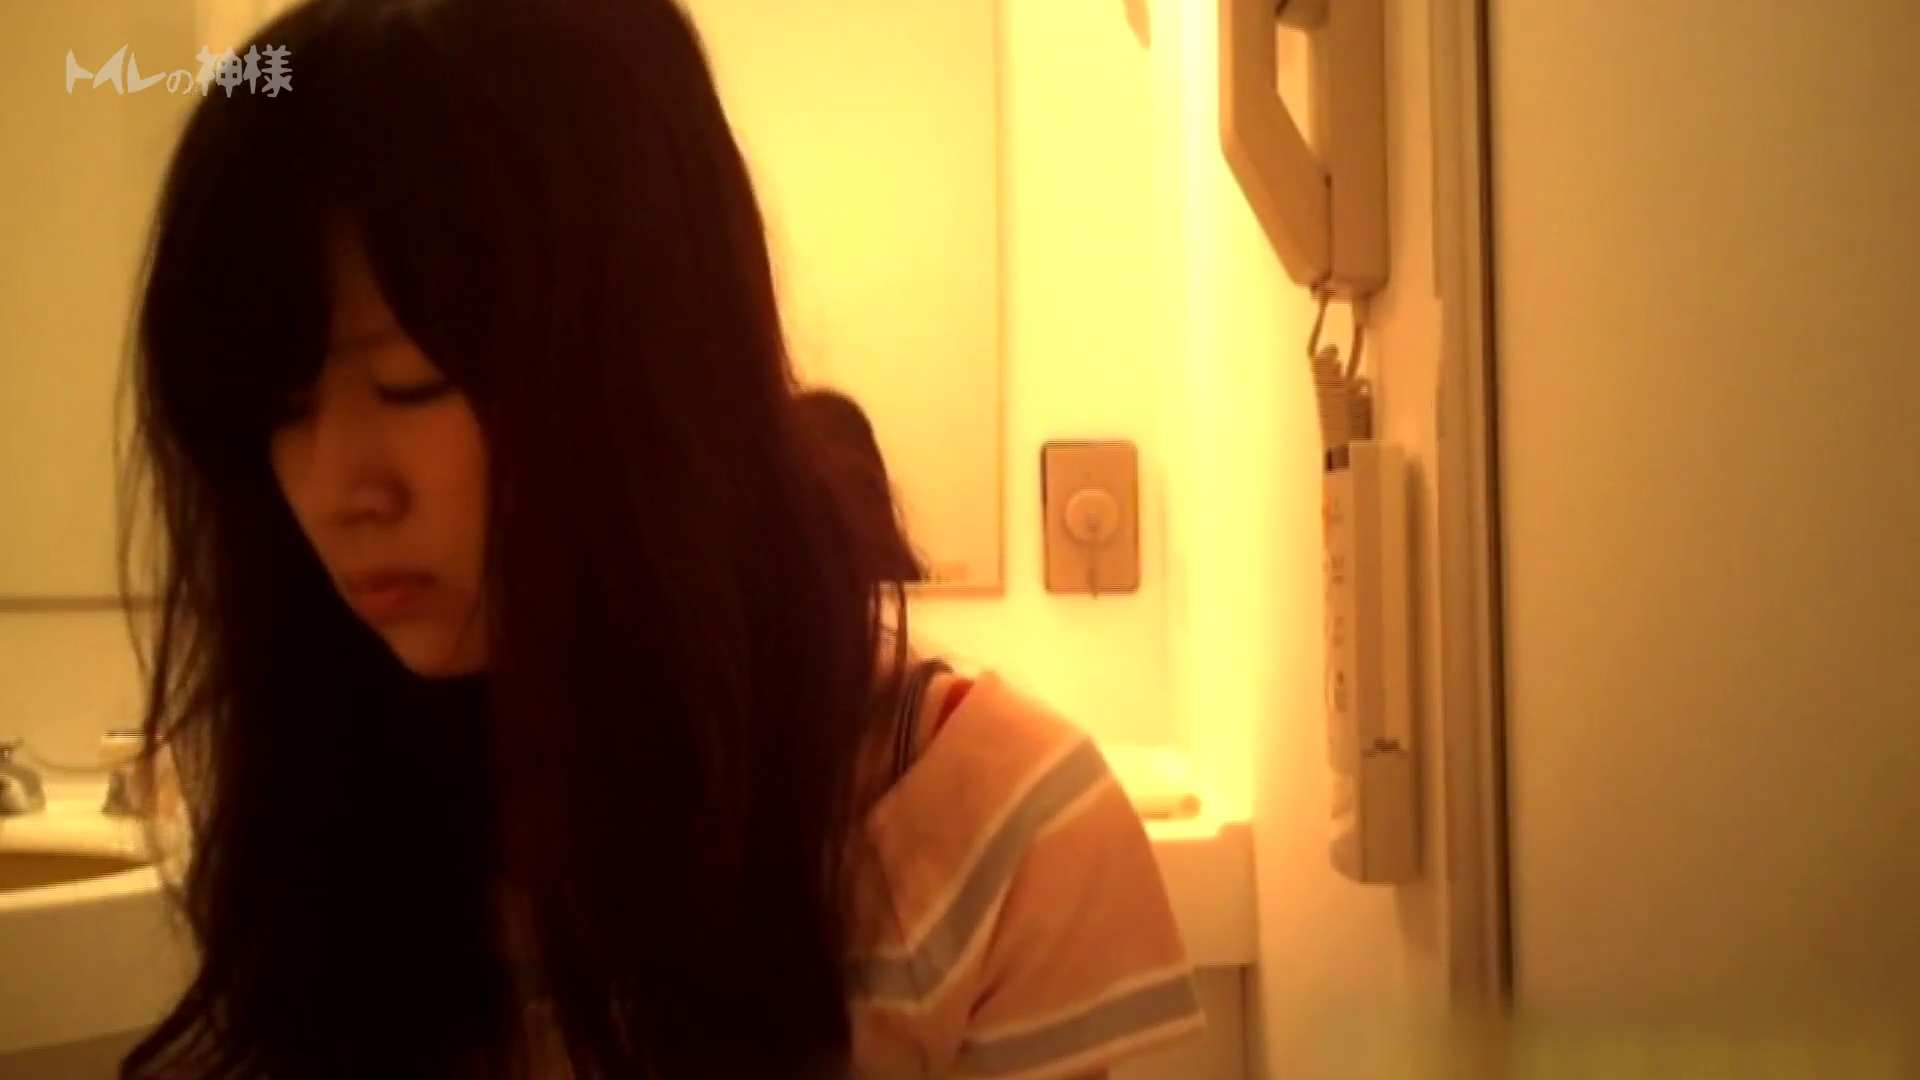 Vol.04 女子大生のトイレ恥態 女子大生 オマンコ動画キャプチャ 89画像 53